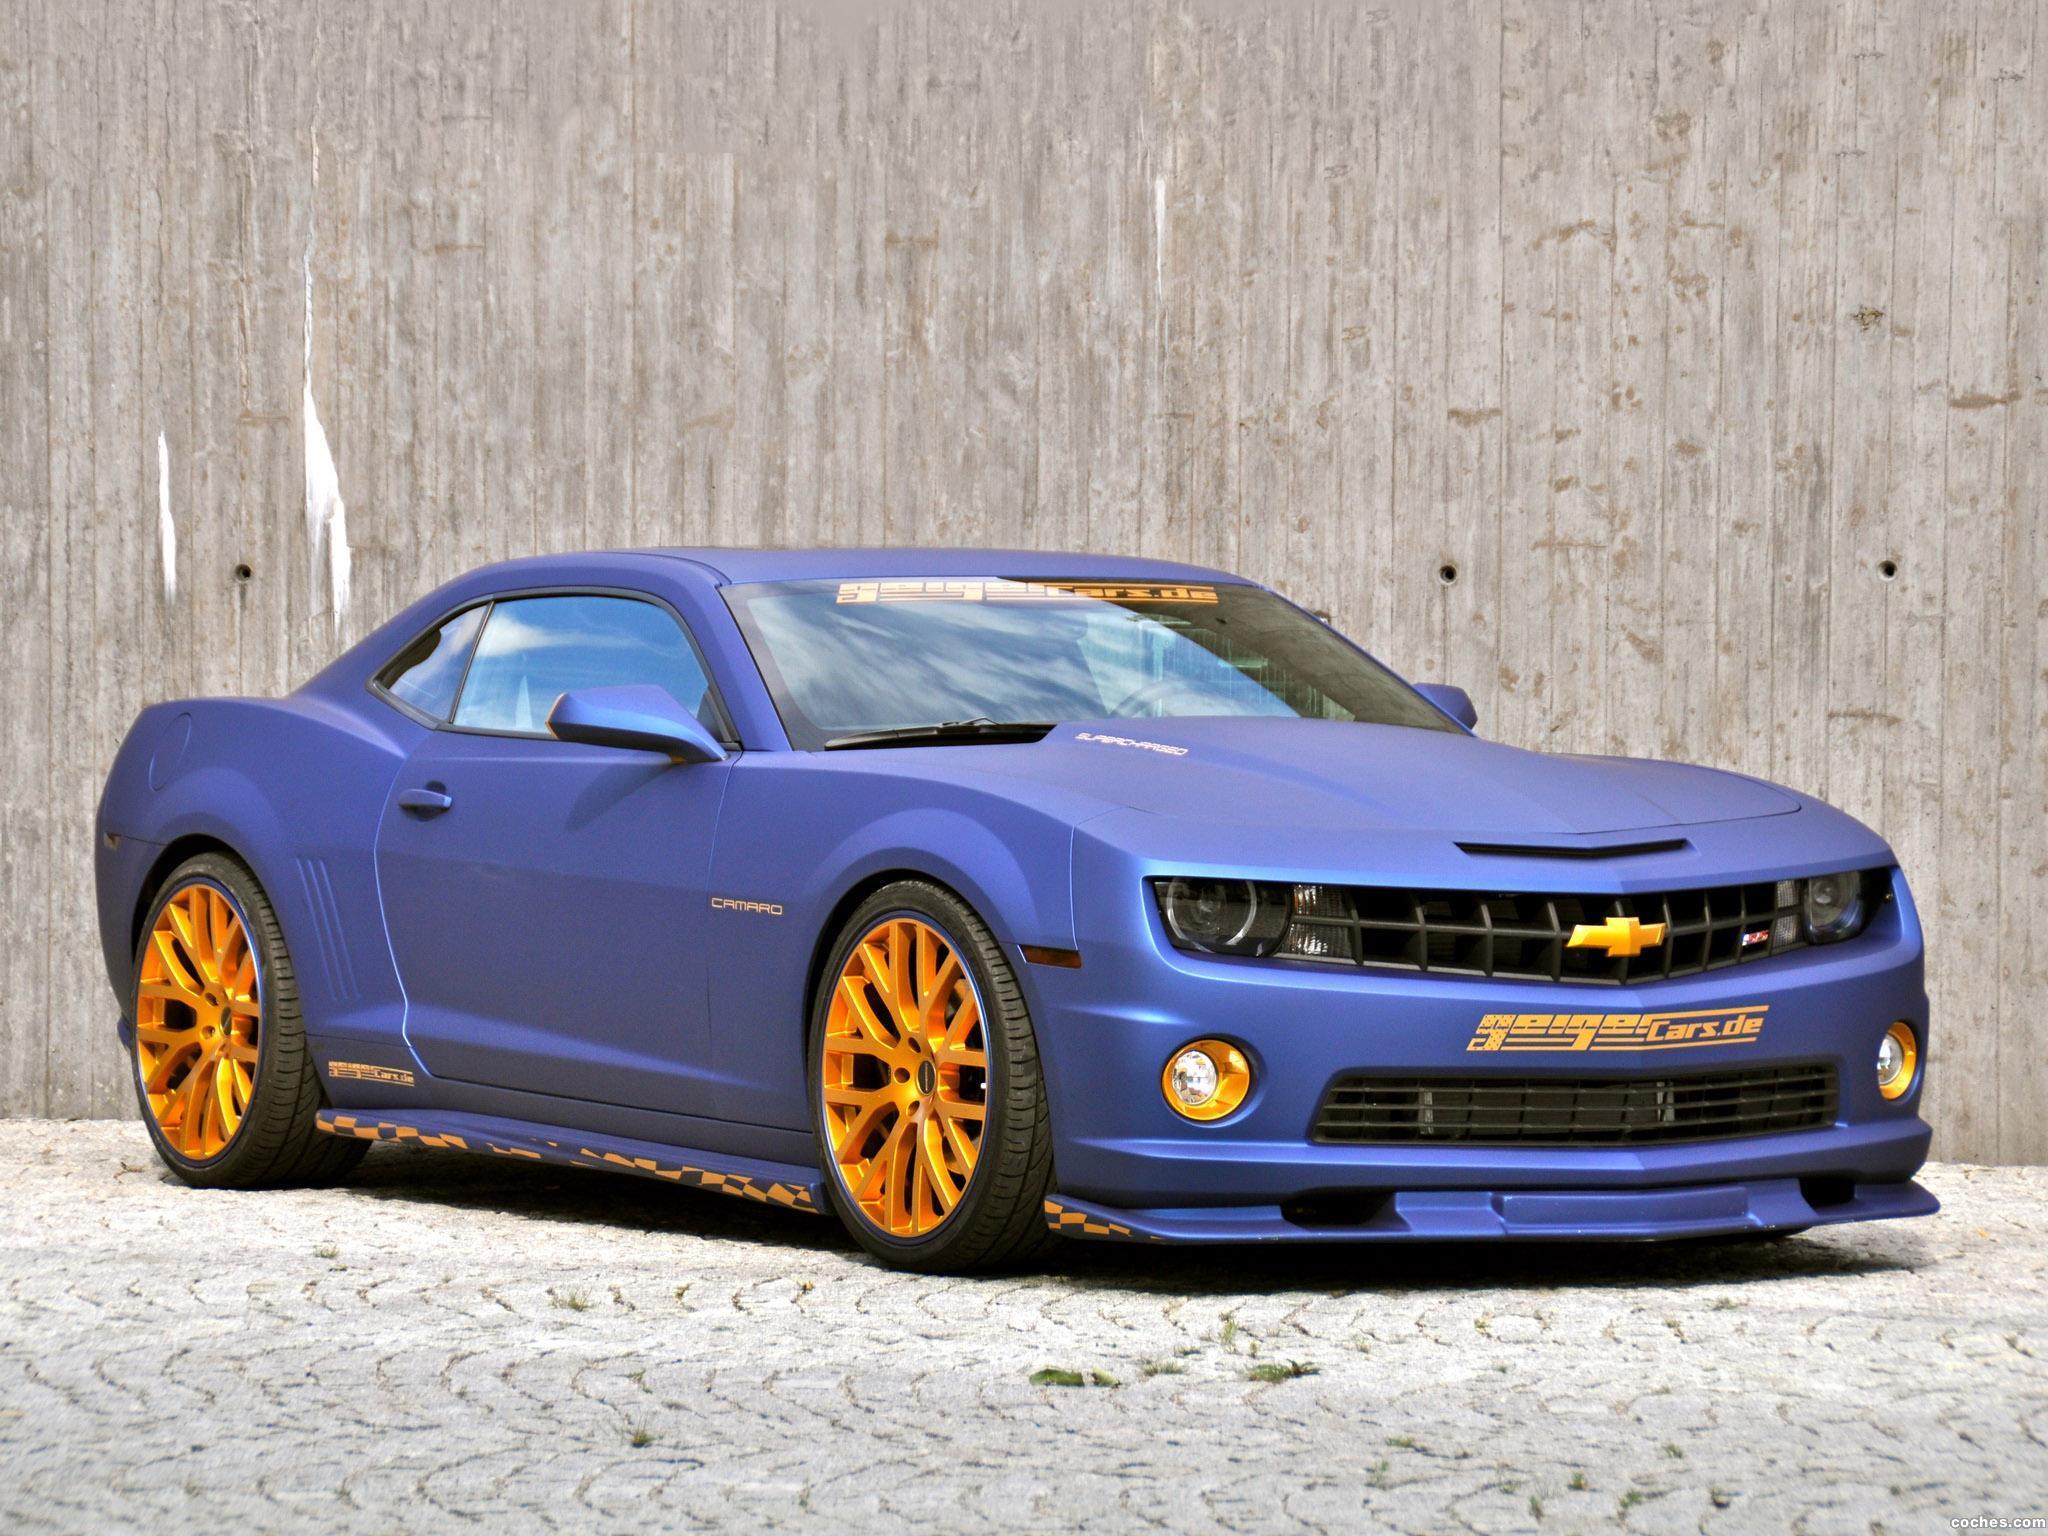 Foto 0 de Geiger Chevrolet Camaro SS Blaumatt Gold 2011